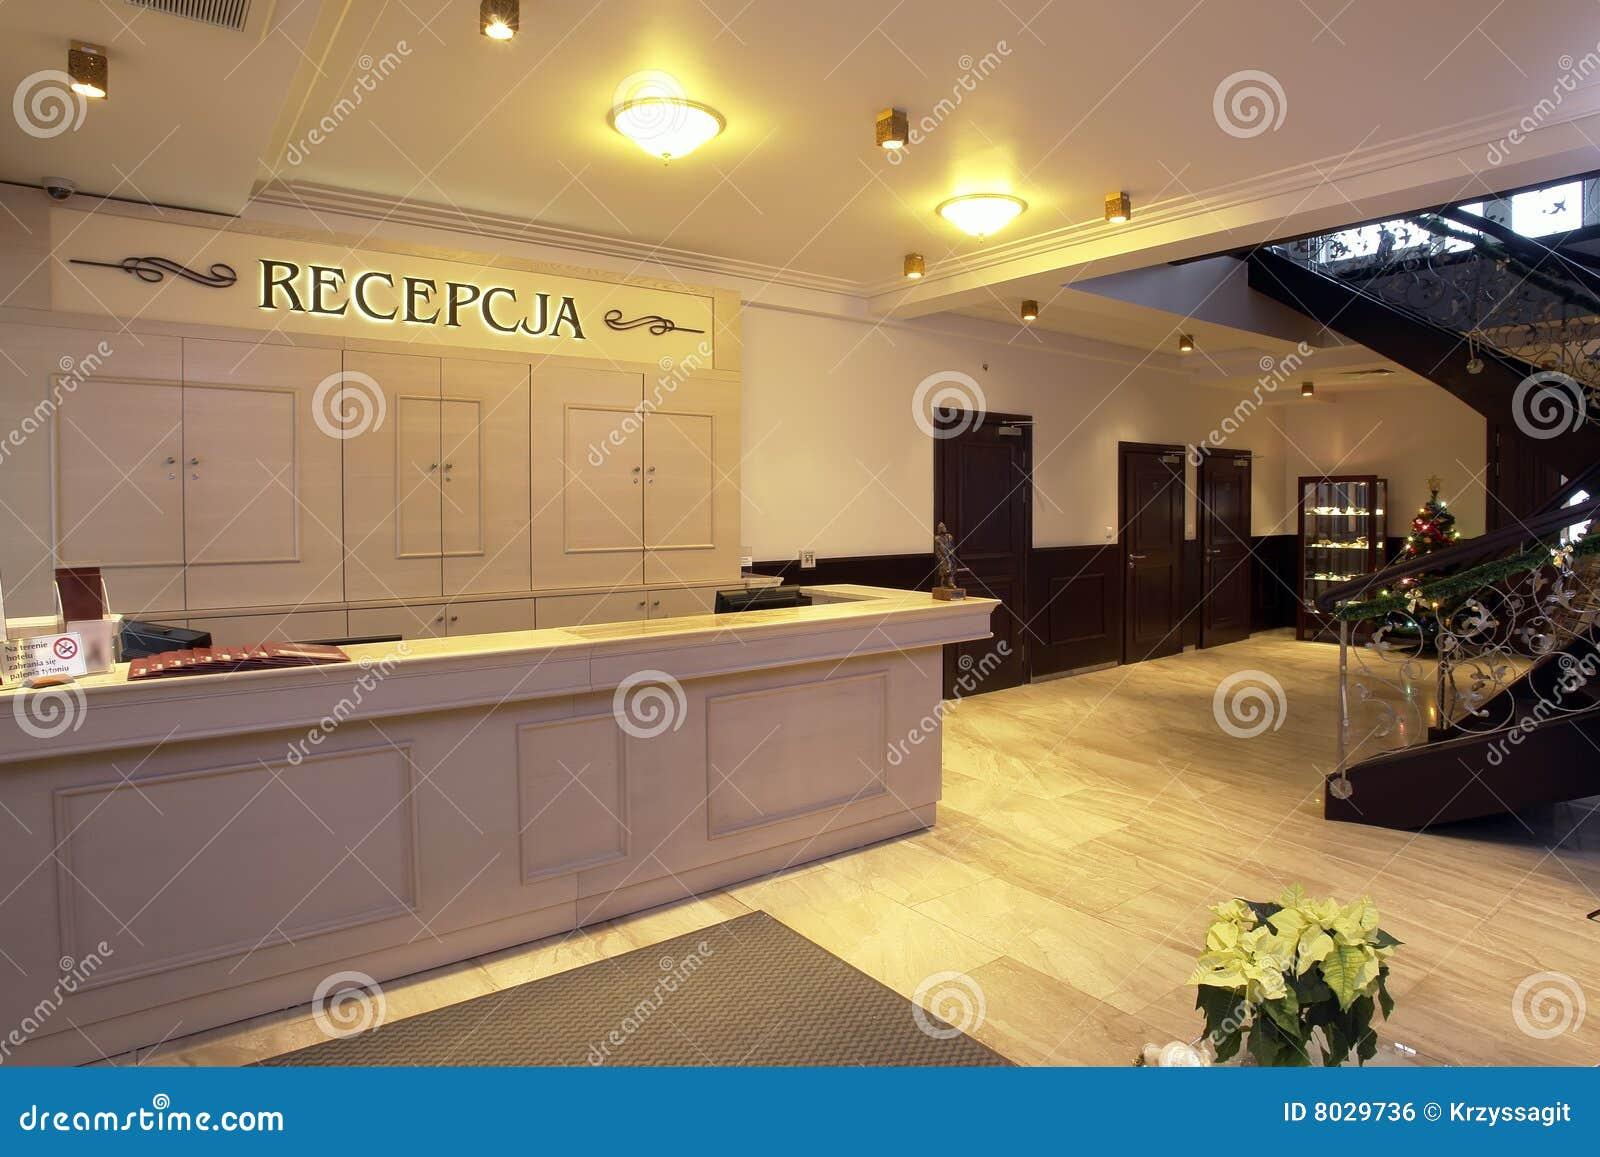 Hotel Reception Desk Royalty Free Stock Image Image 8029736